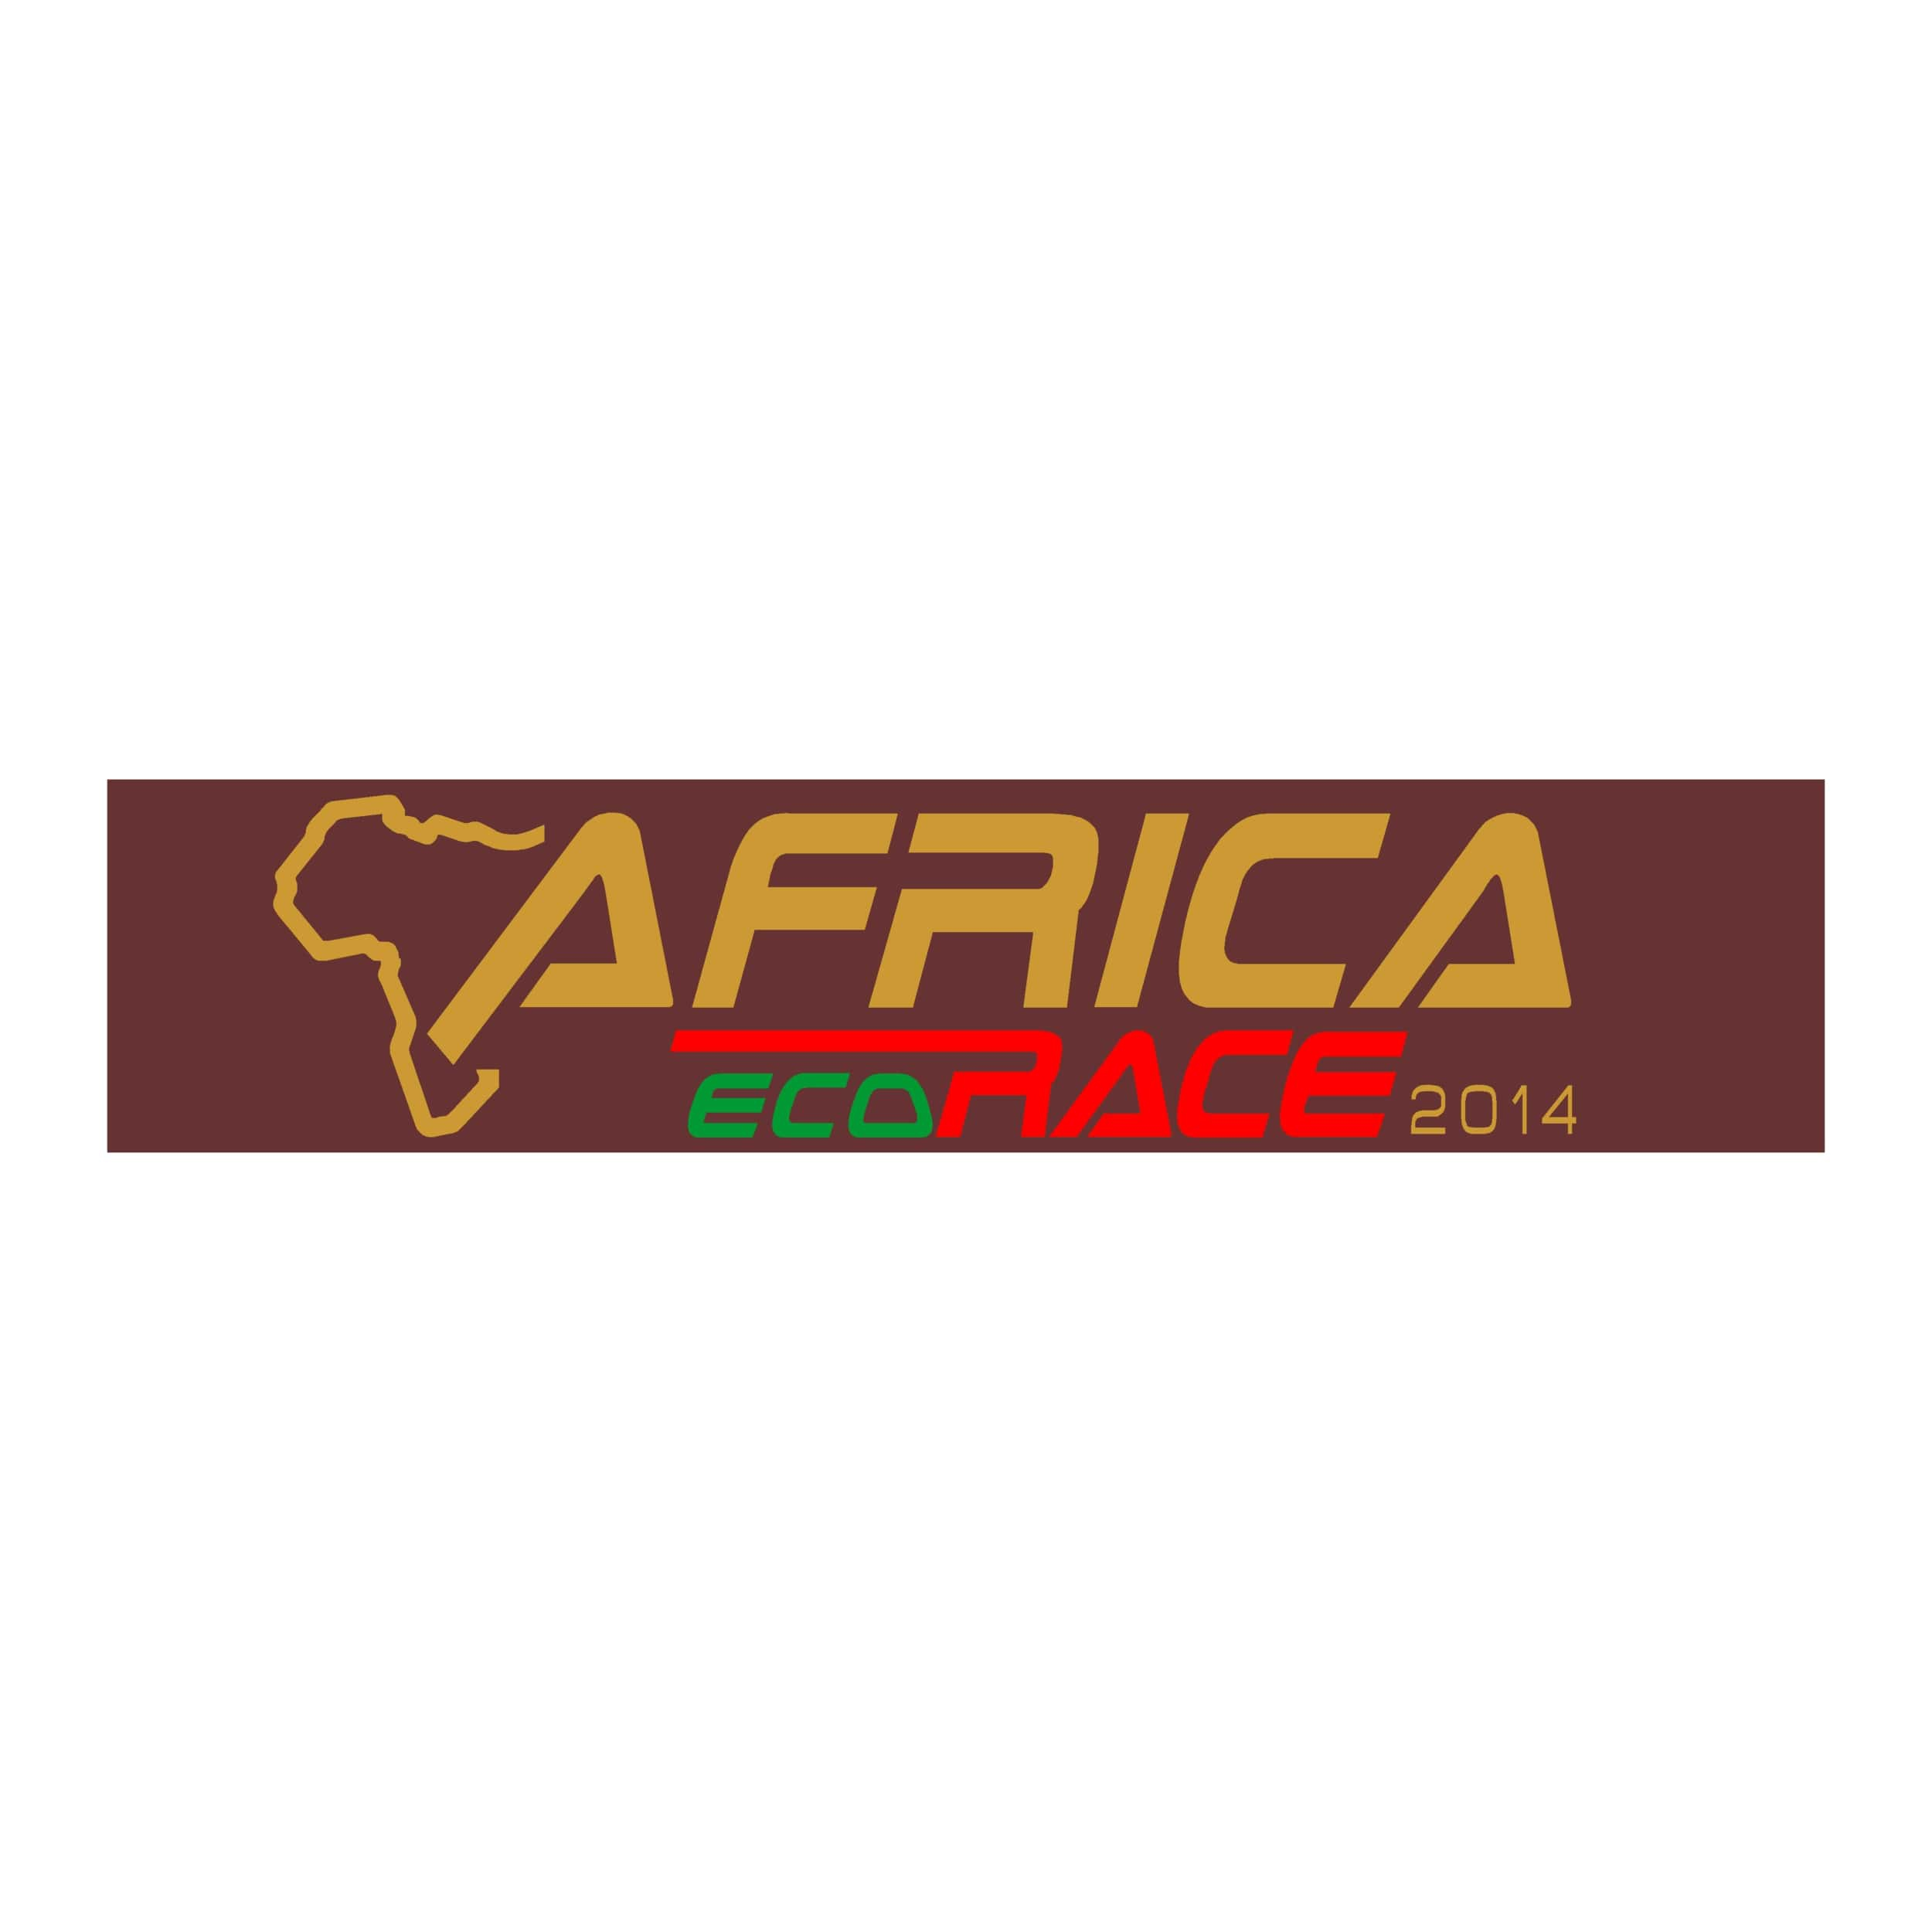 stickers-africa-eco-race-ref-8-dakar-land-rover-4x4-tout-terrain-rallye-competition-pneu-tuning-amortisseur-autocollant-fffsa-min